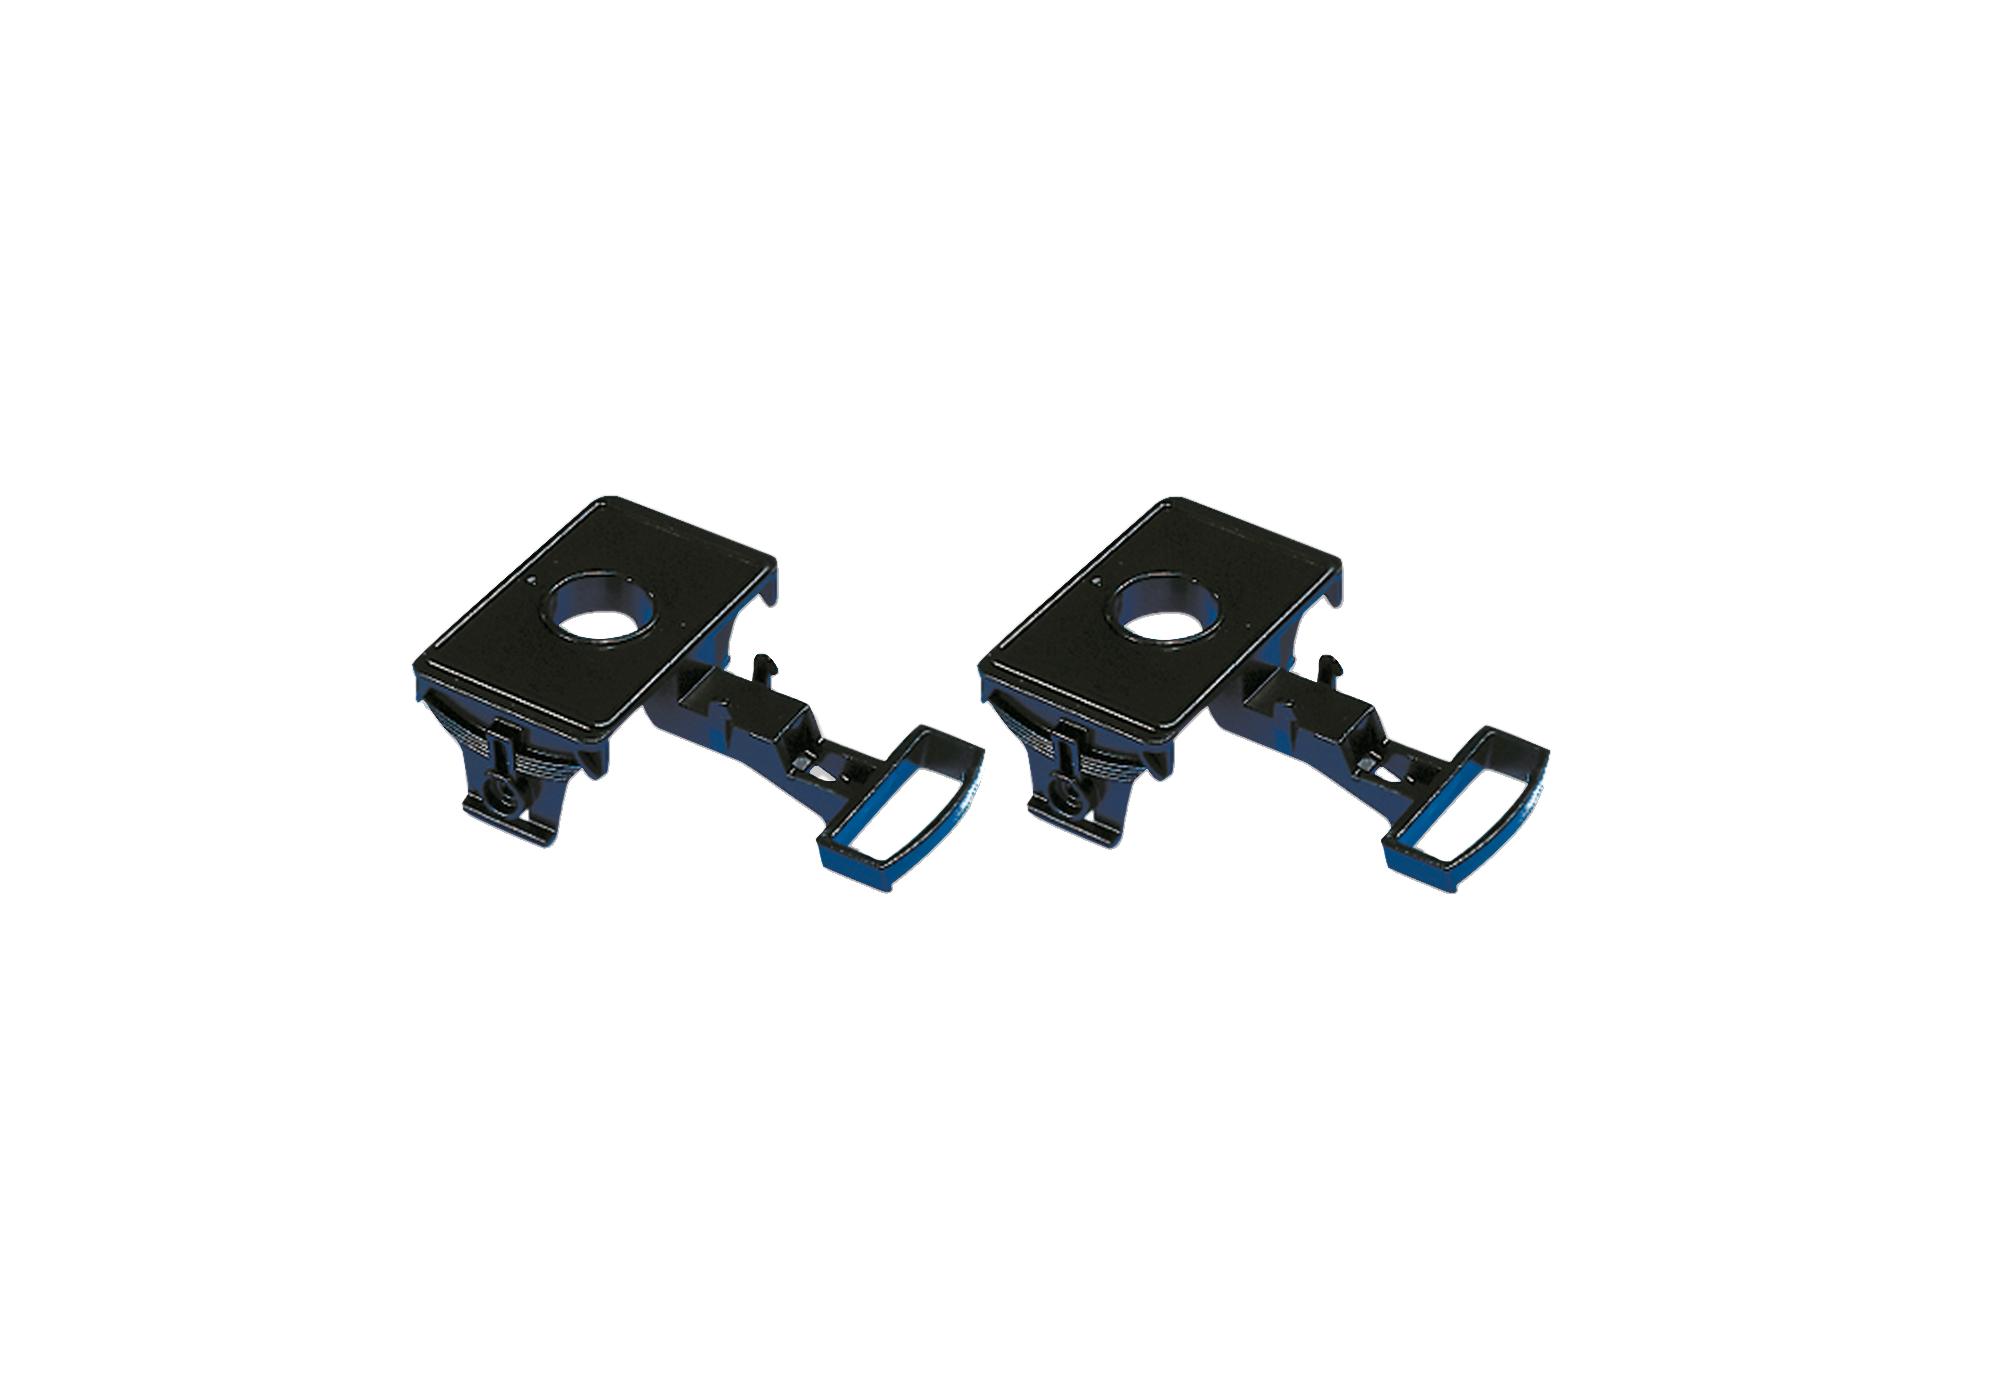 http://media.playmobil.com/i/playmobil/7561_product_detail/2 podwozia skrętne